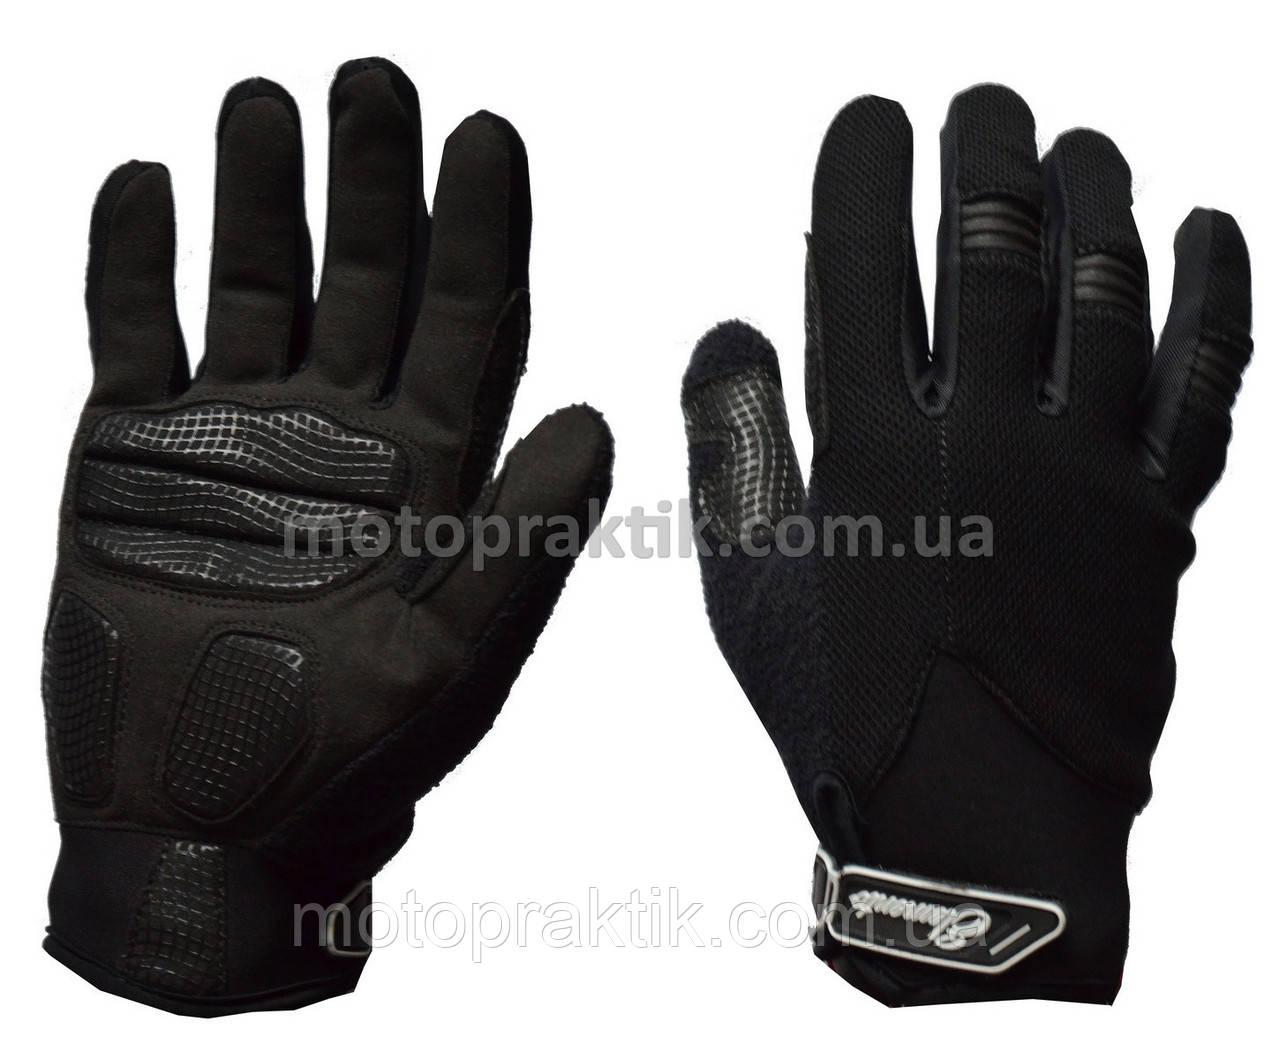 Elemento 202 MX Gloves Black, L Мотоперчатки кросс